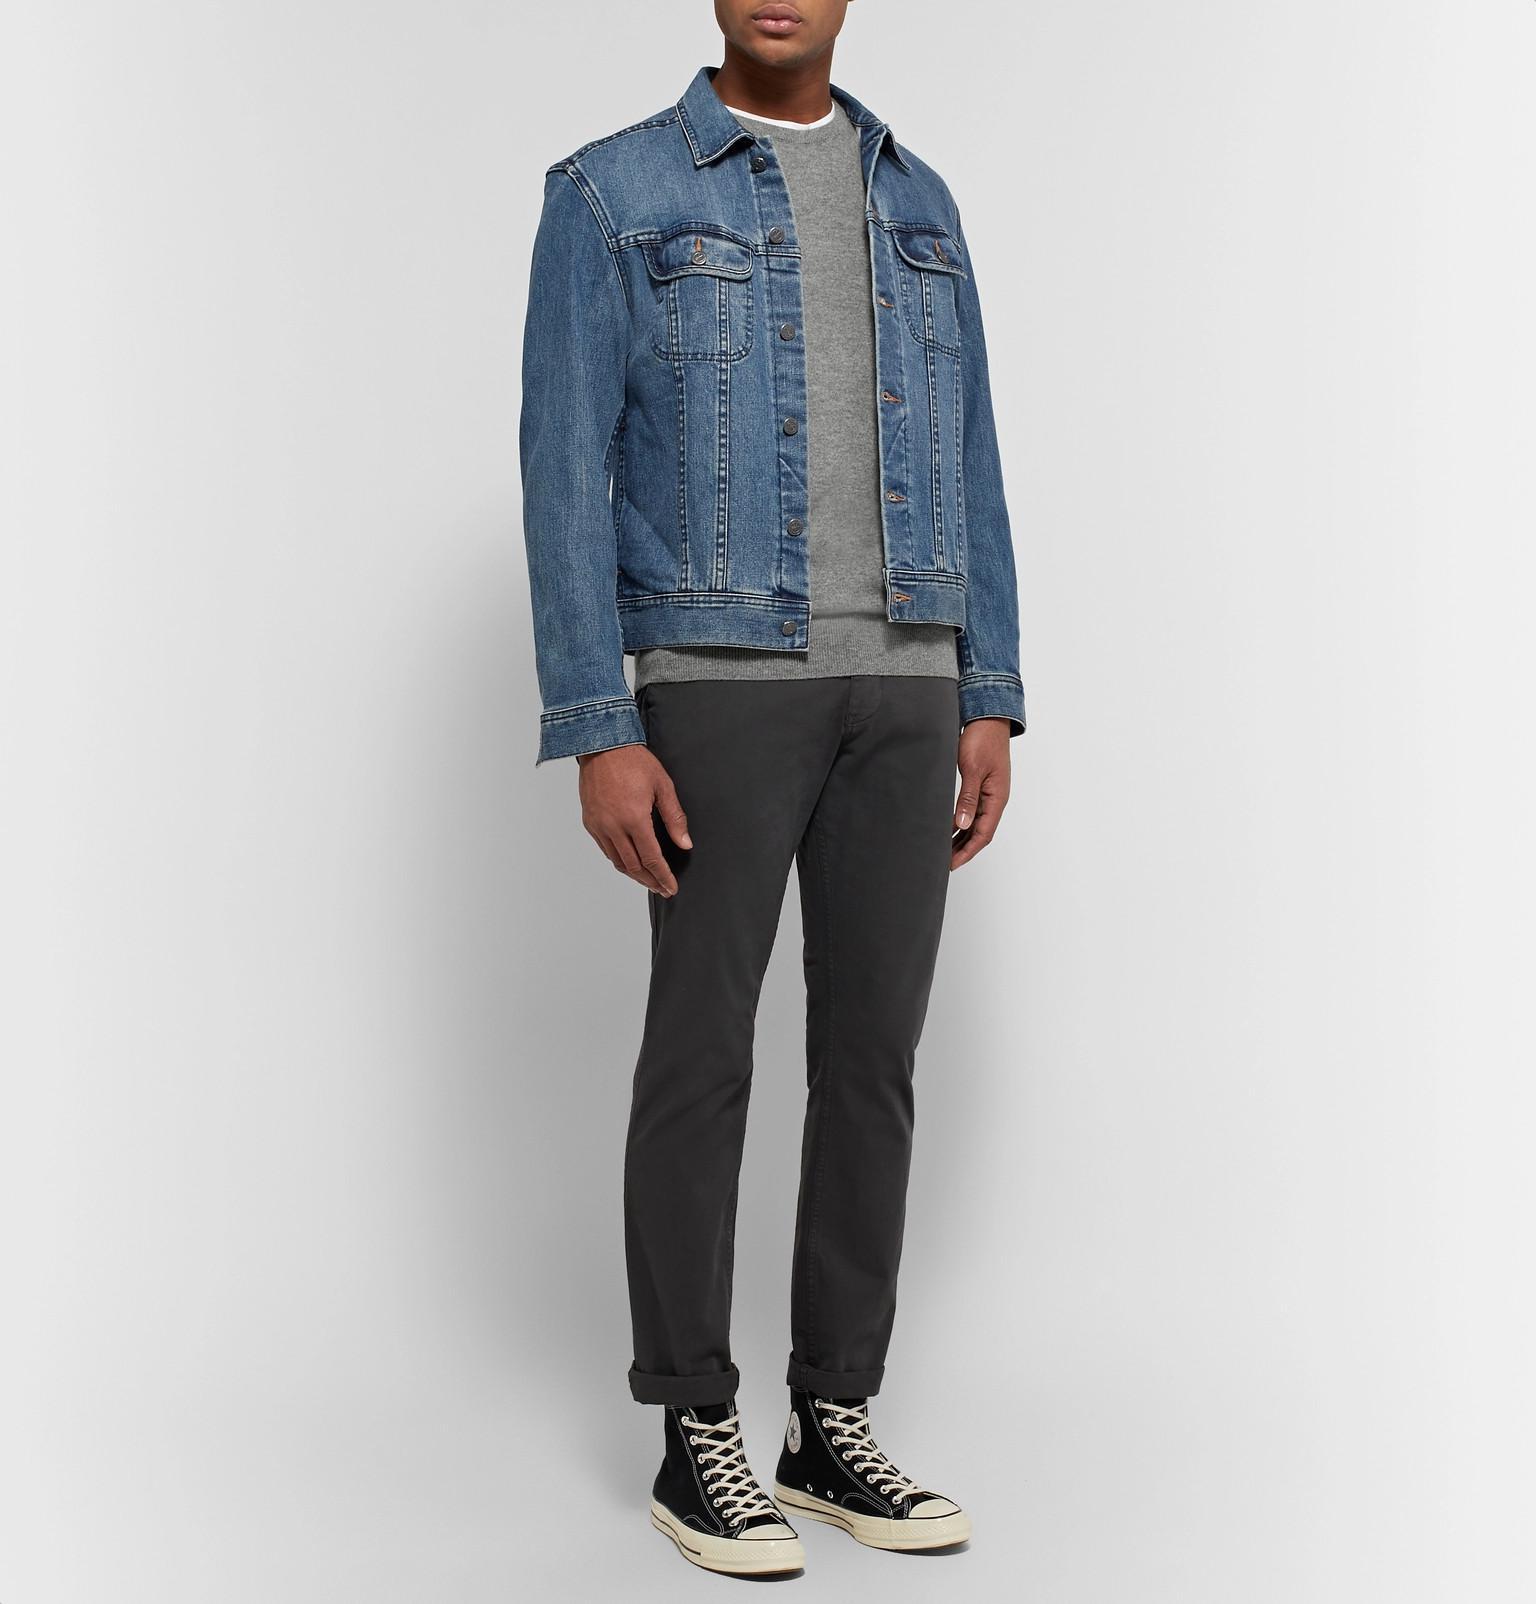 Gray Cashmere For Sweater Charles Lyst Nn07 View Fullscreen Men q7wZT4d